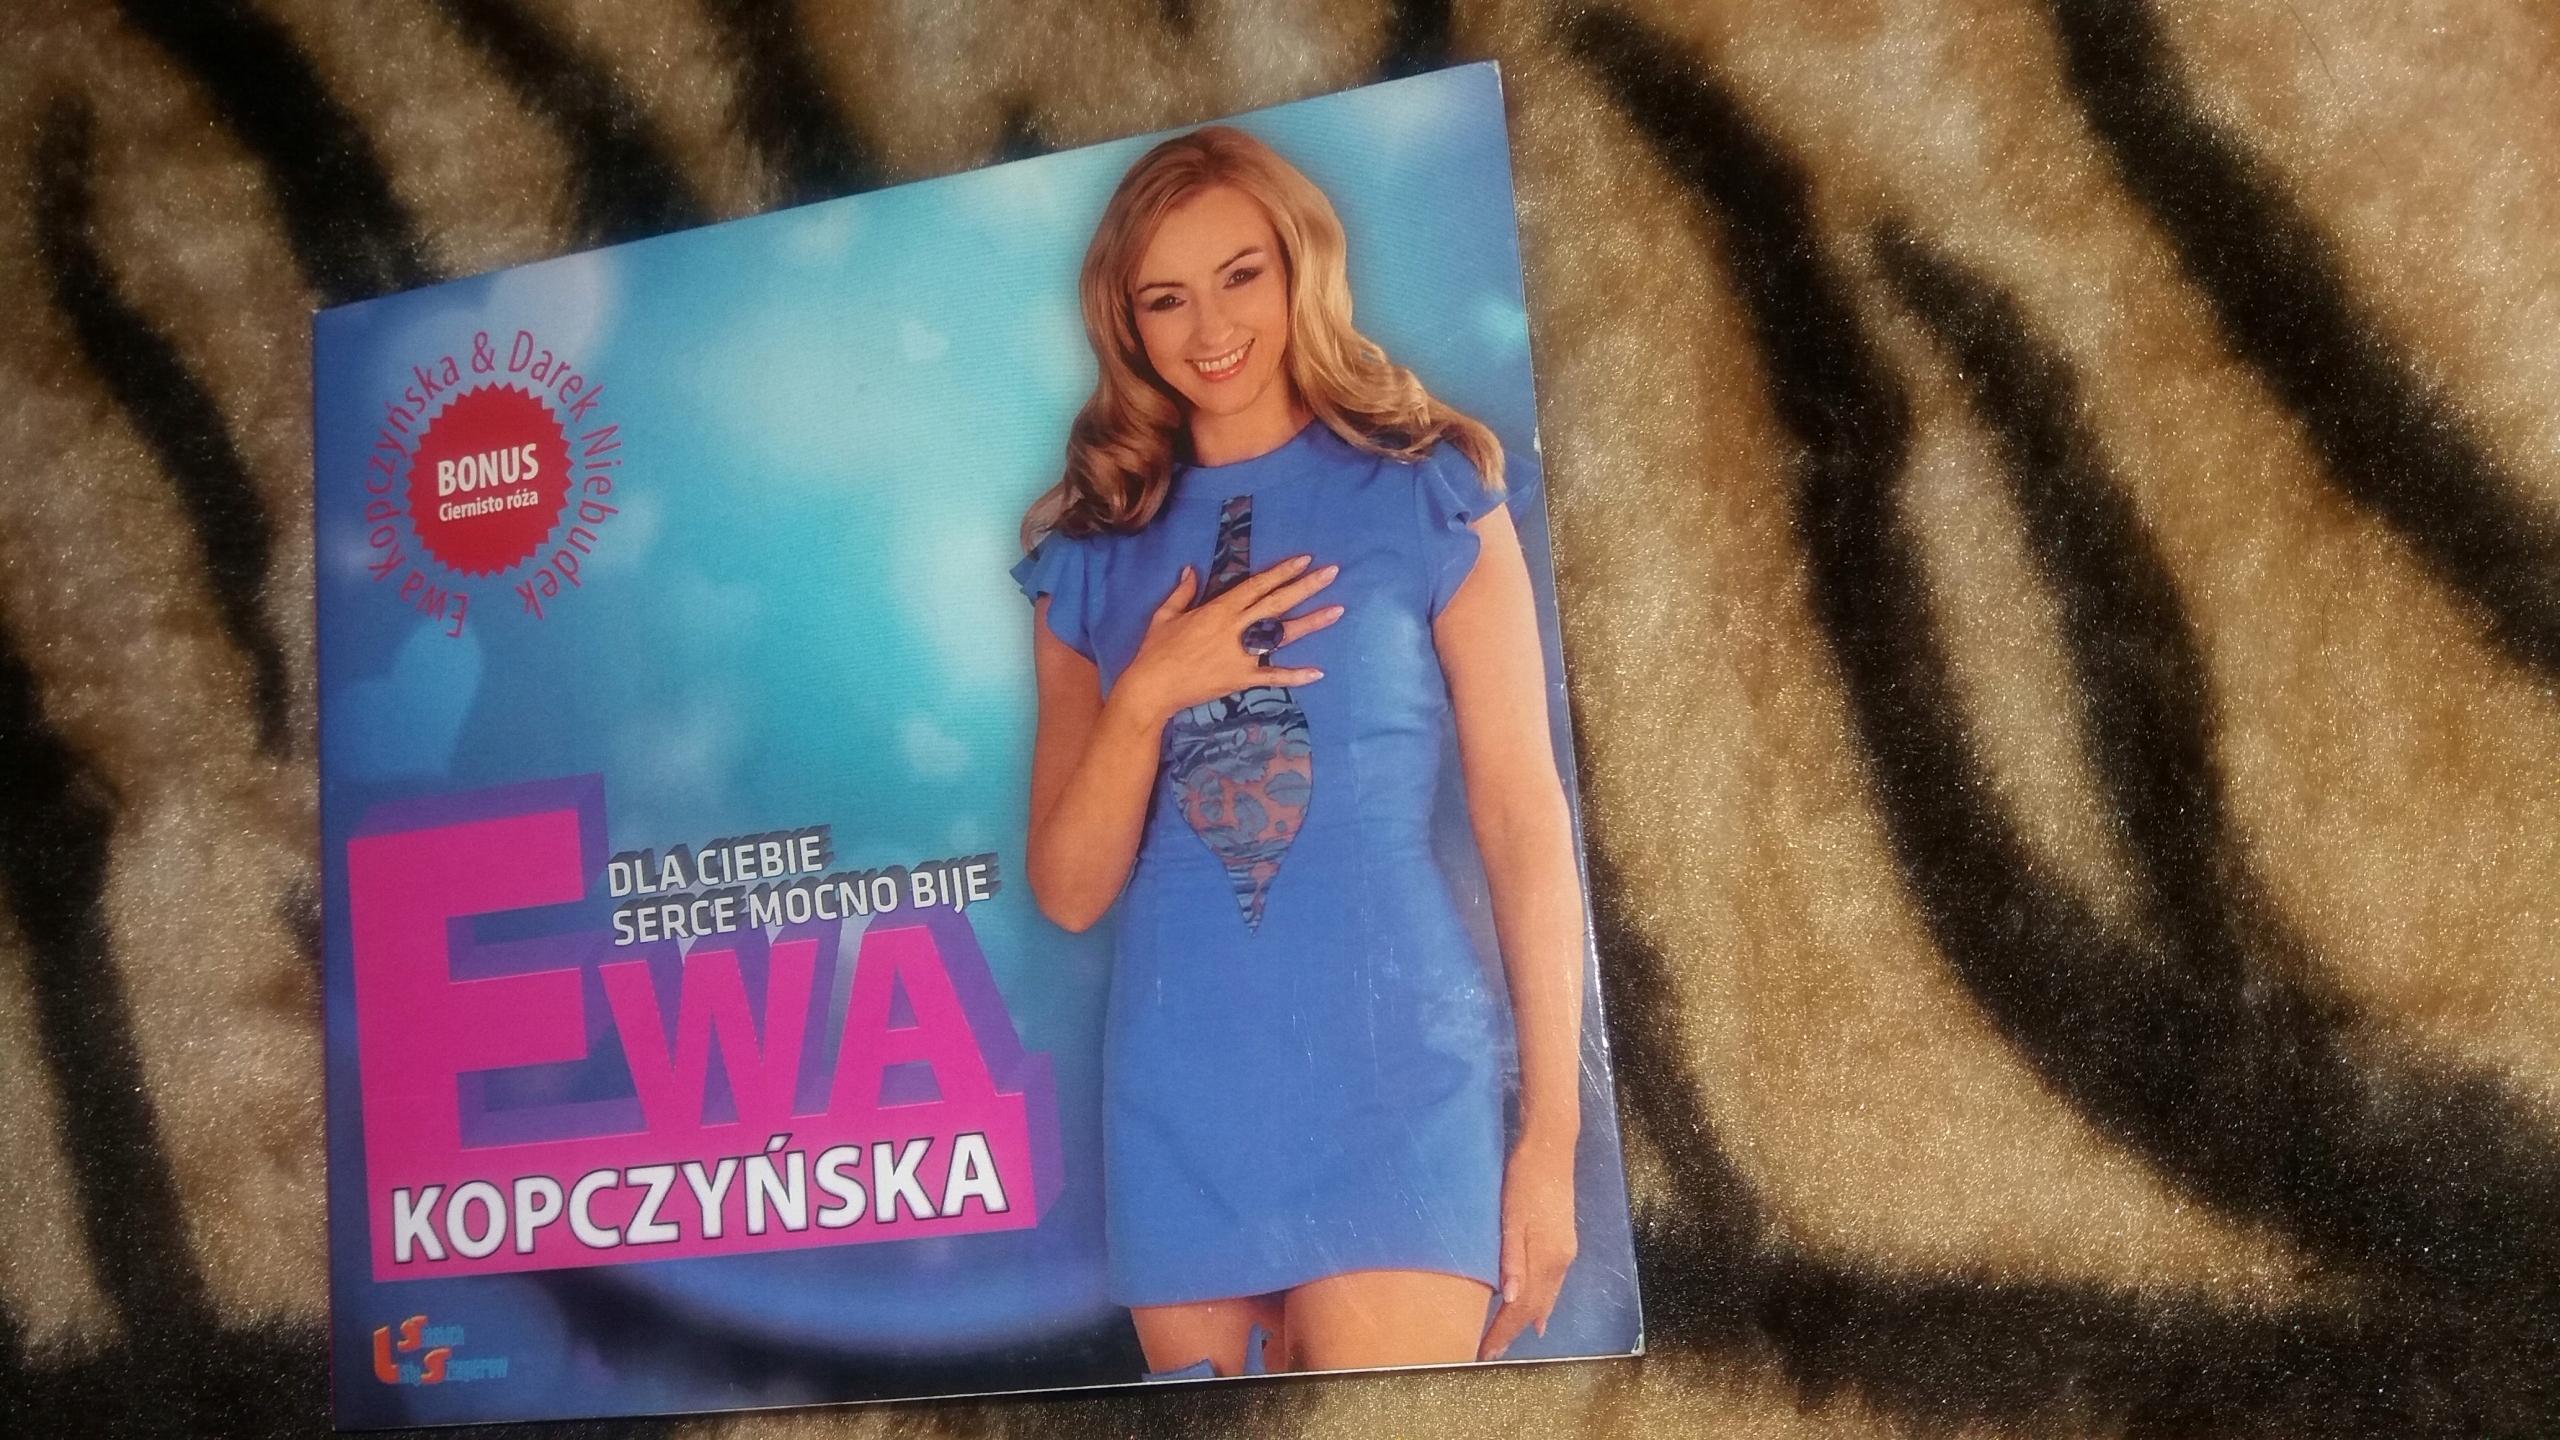 Fotos Ewa Kopczynska nudes (14 photos), Pussy, Is a cute, Selfie, cleavage 2017